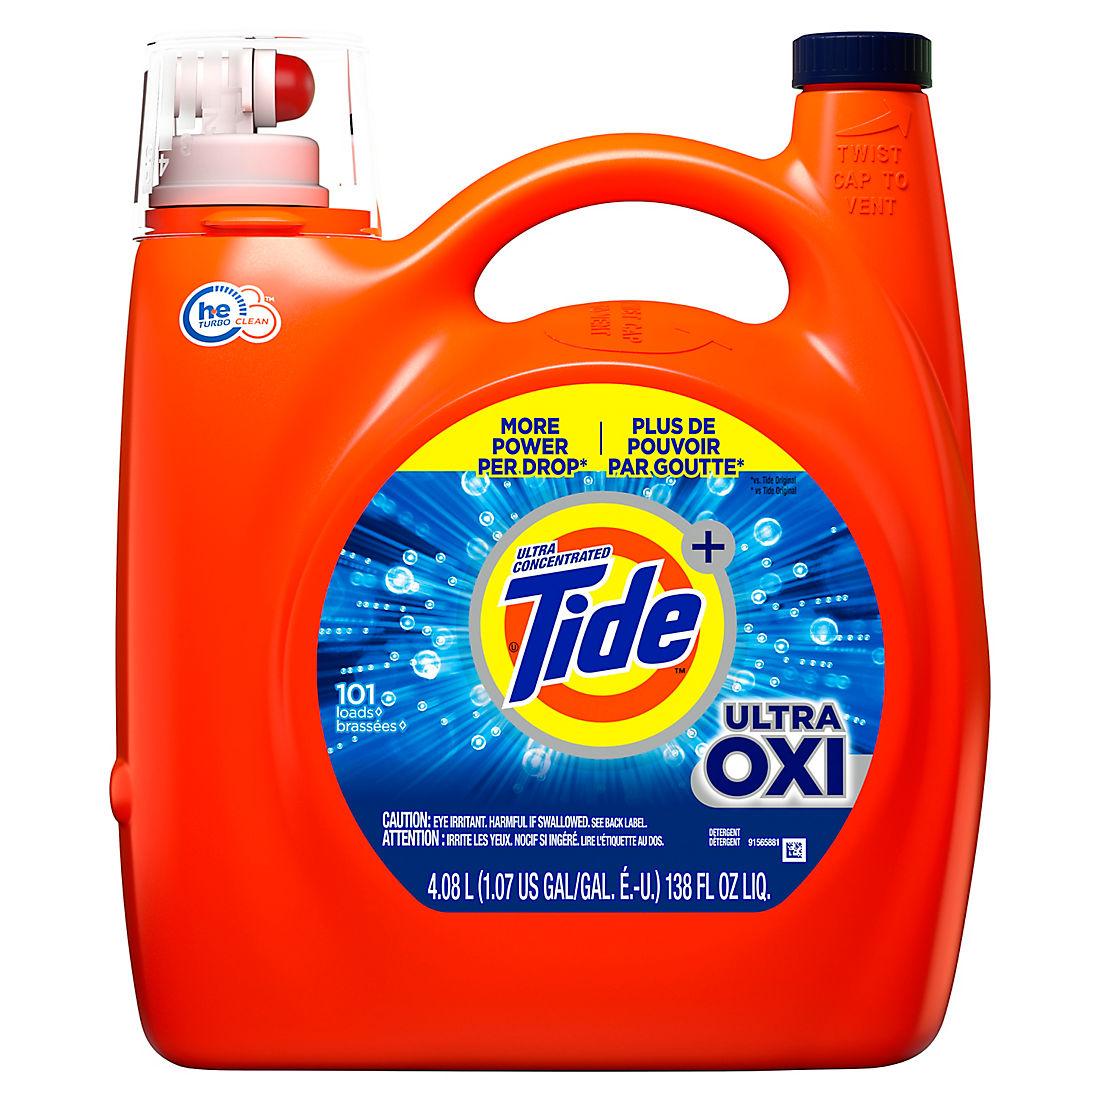 Ultra Oxi Liquid Laundry Detergent